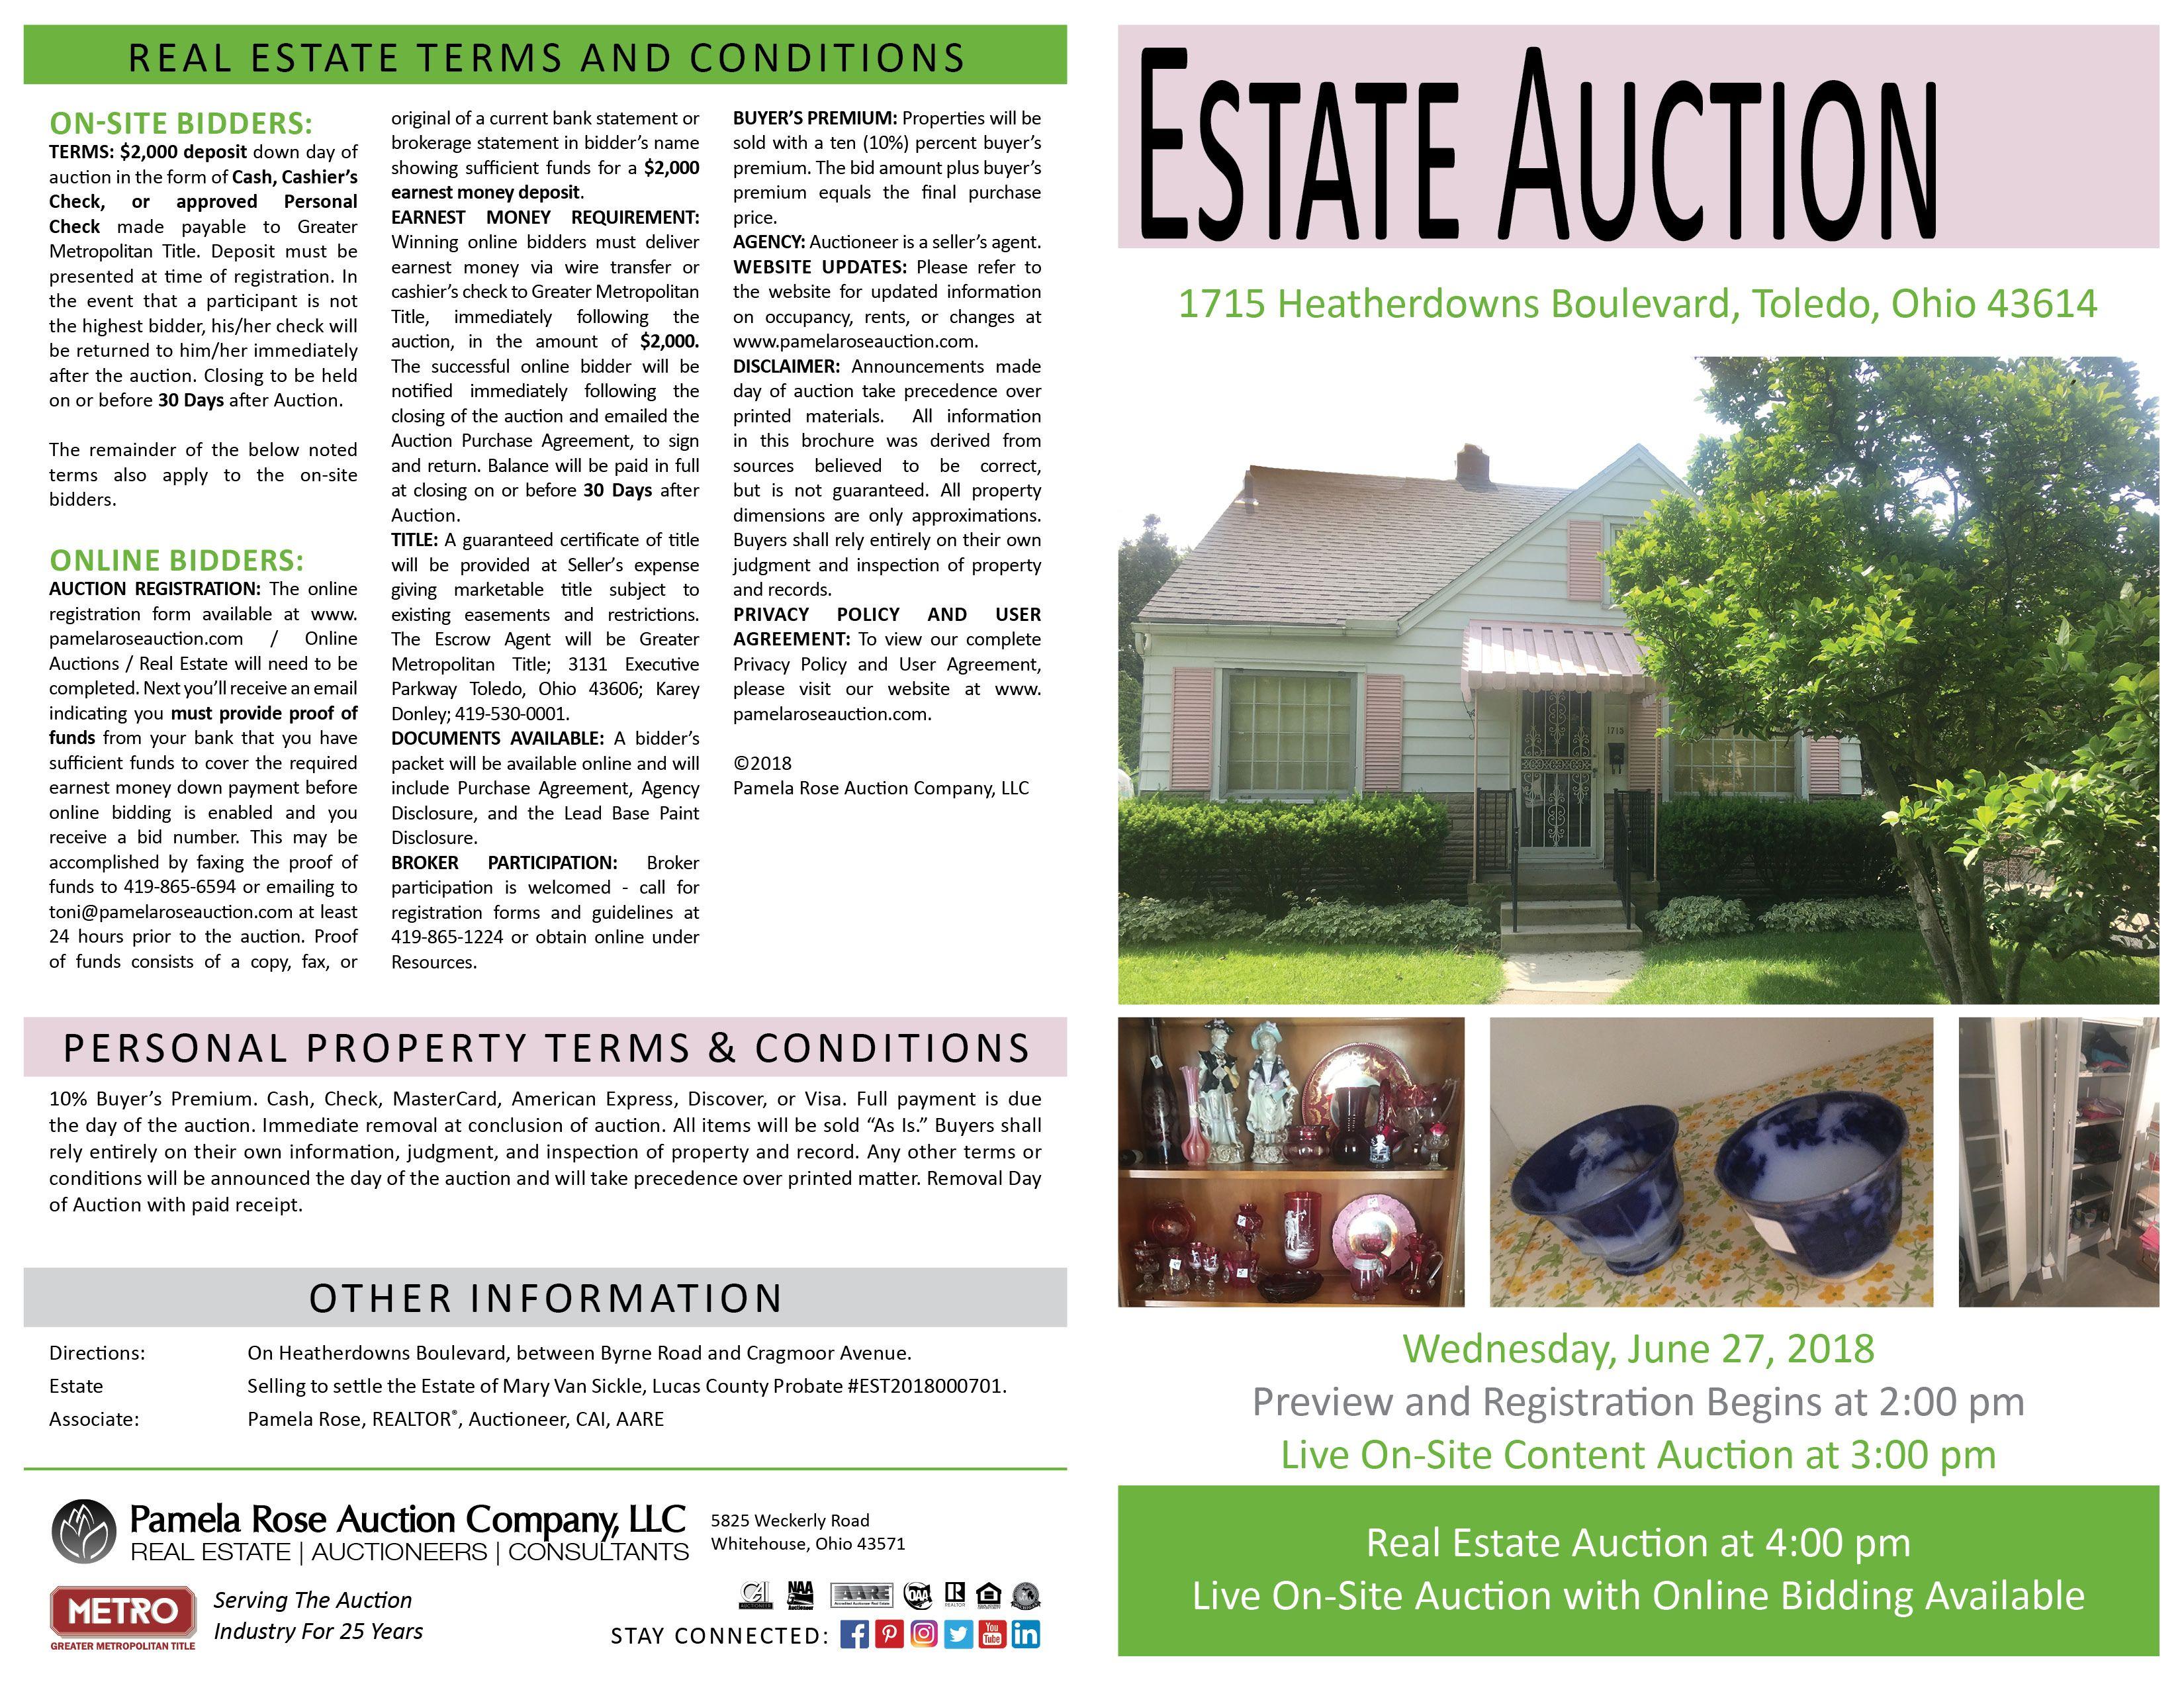 Estate Auction At 1715 Heatherdowns Boulevard Toledo Ohio 43614